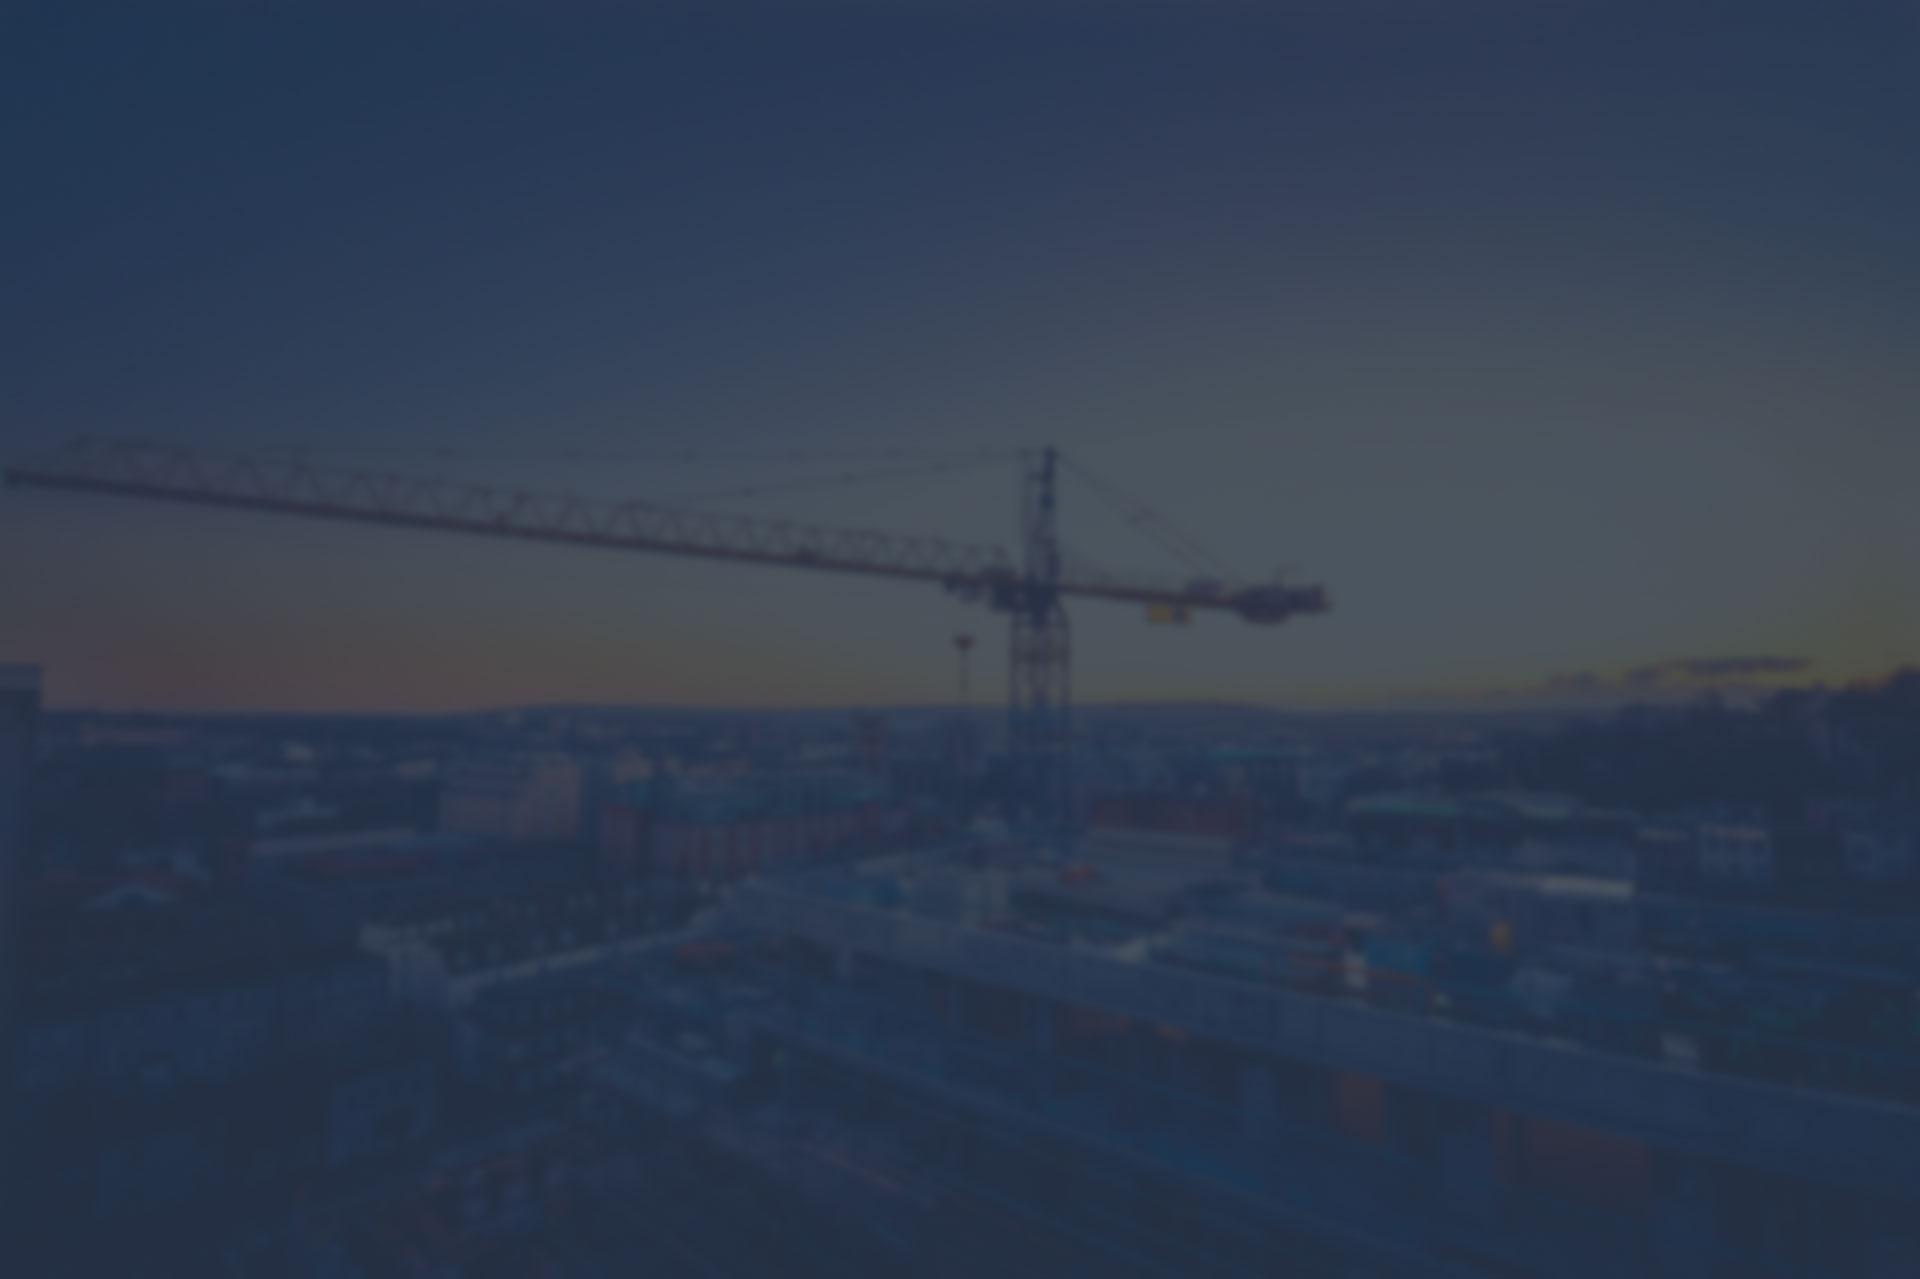 crane-overlay